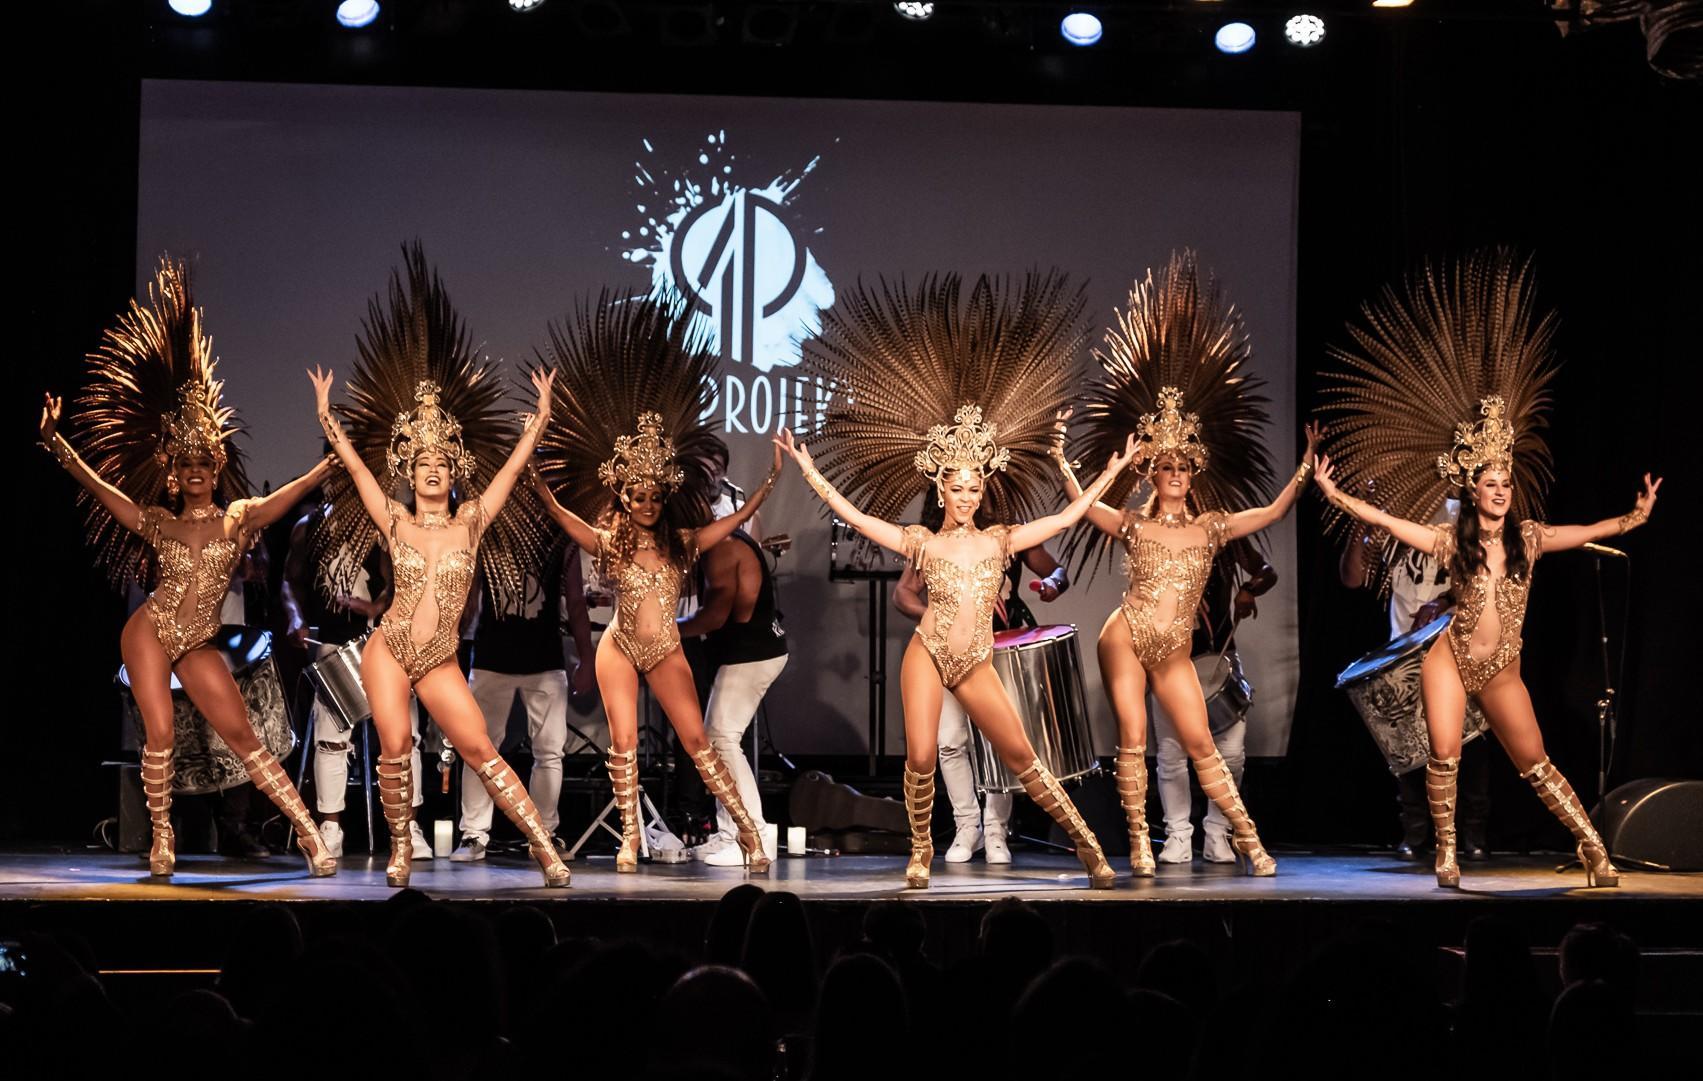 rio projekt dancers